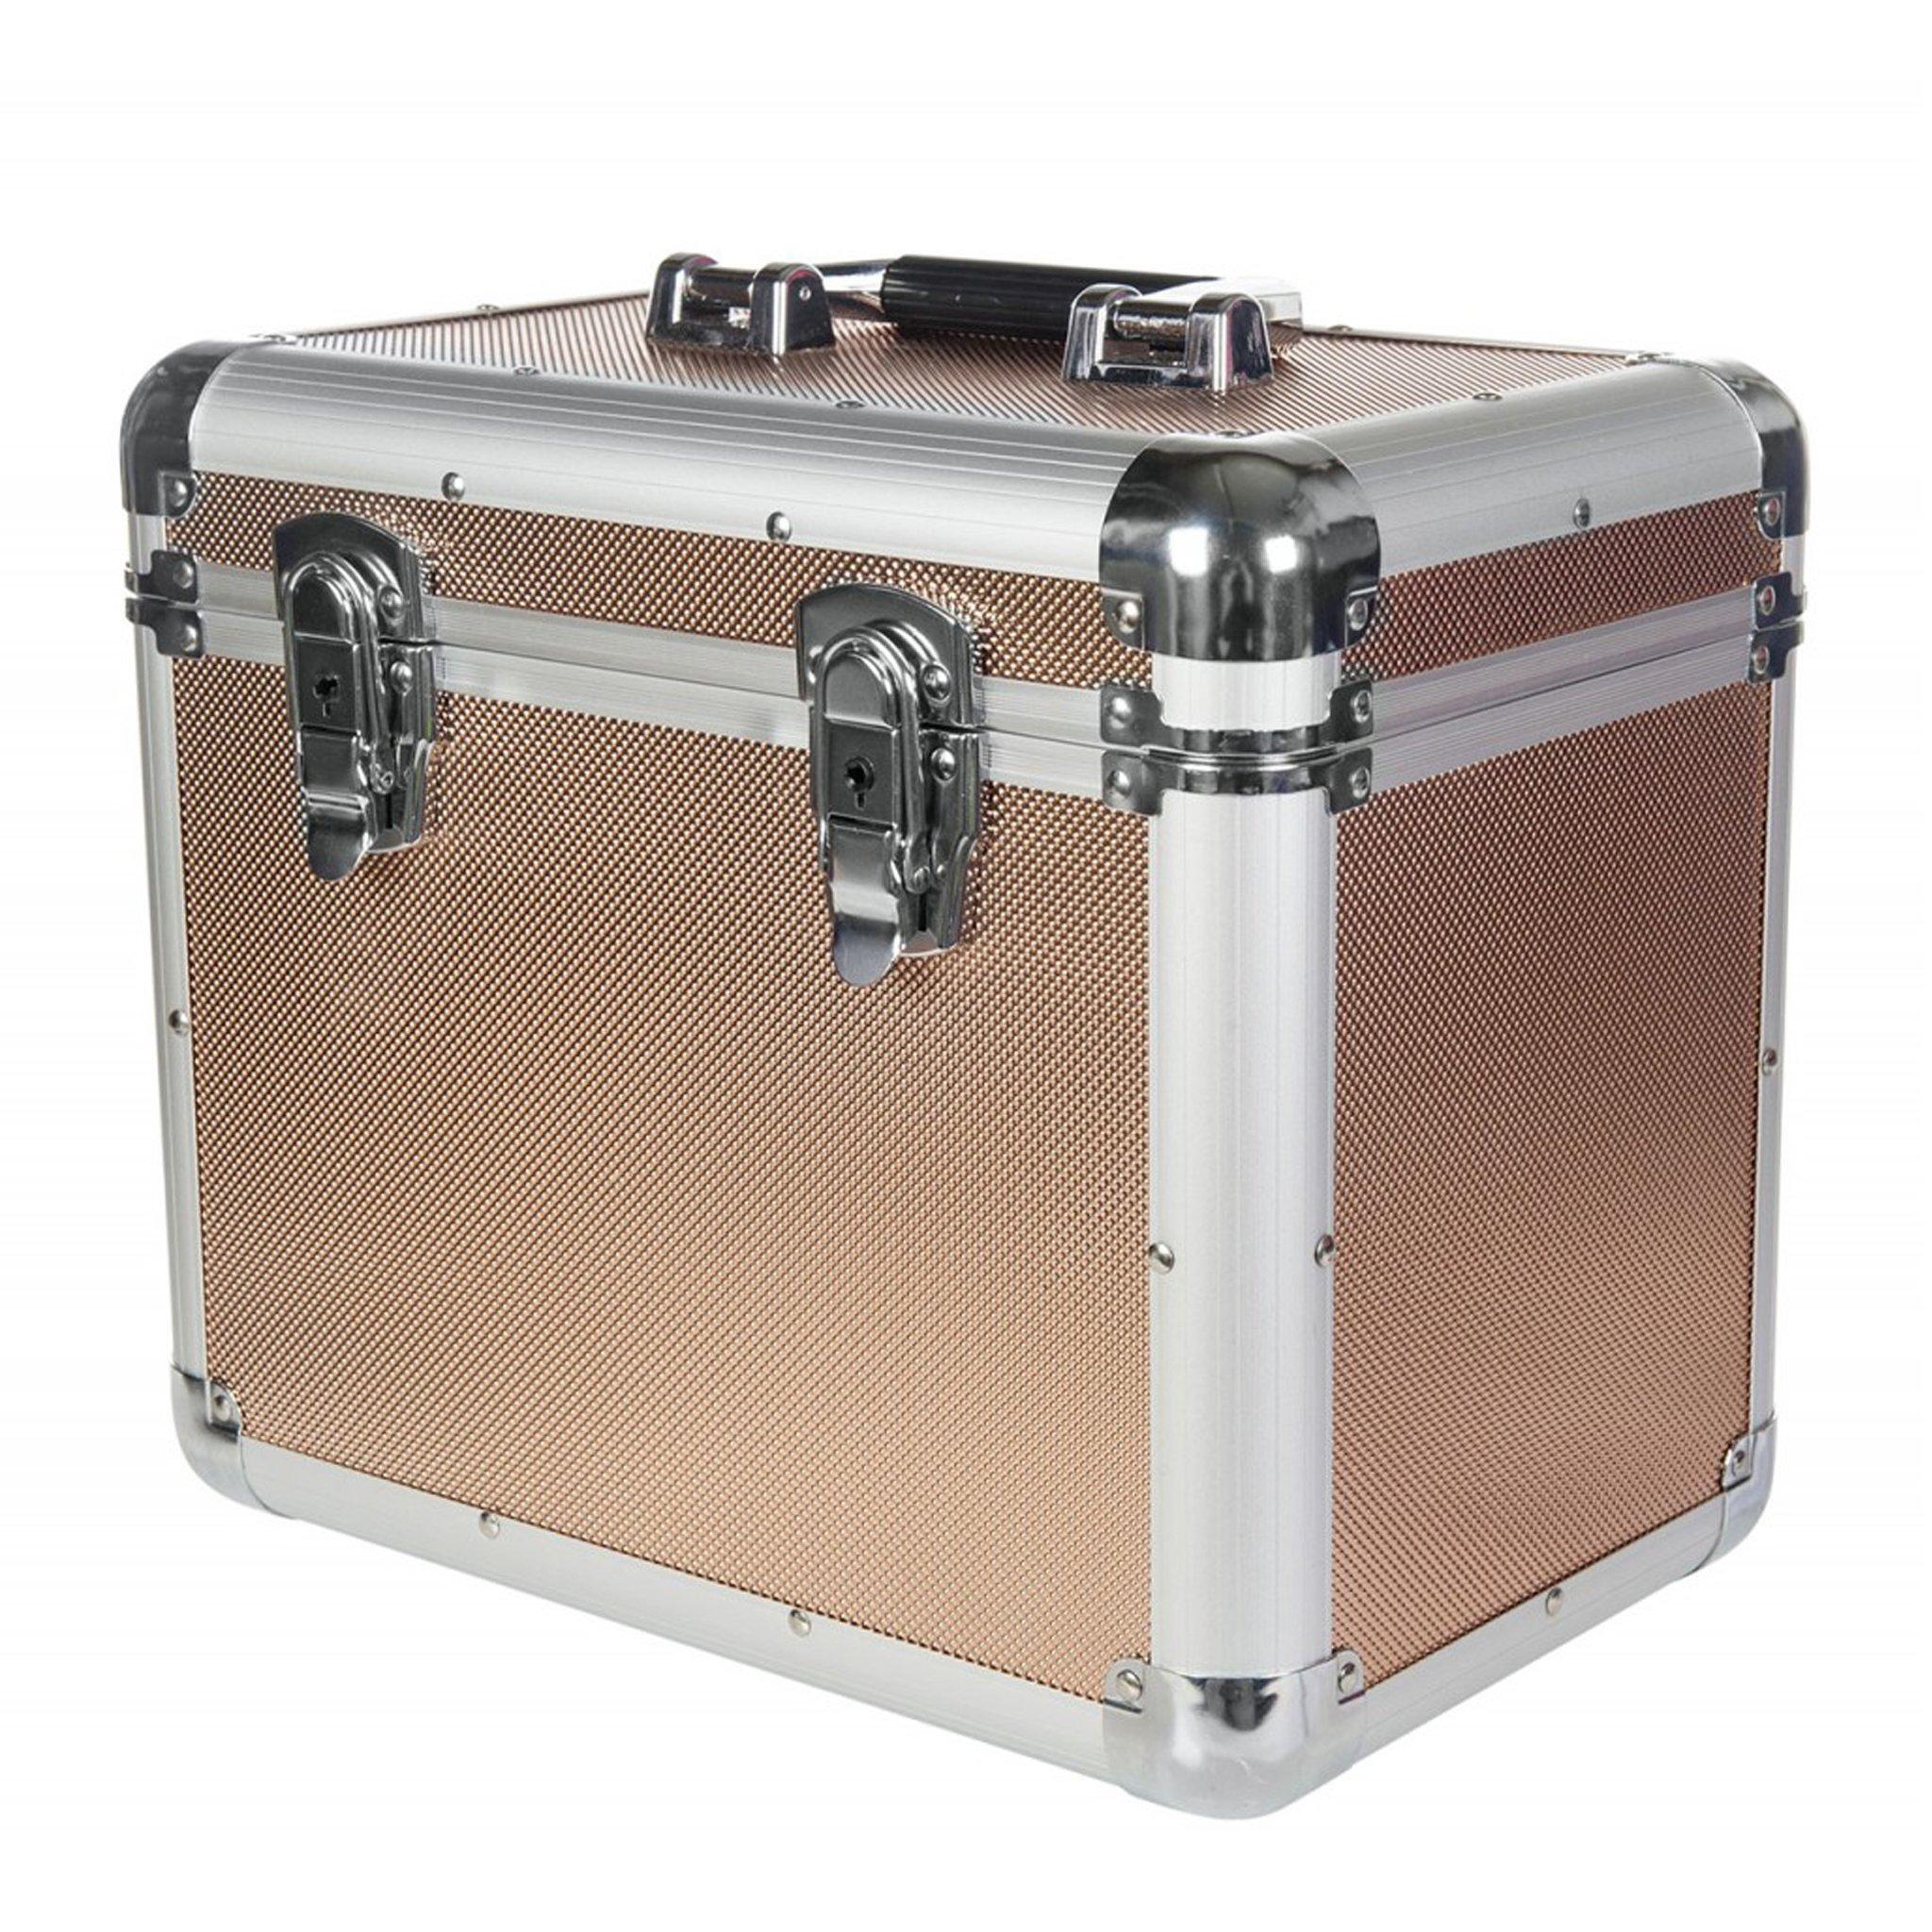 HKM Rosegold Grooming Box